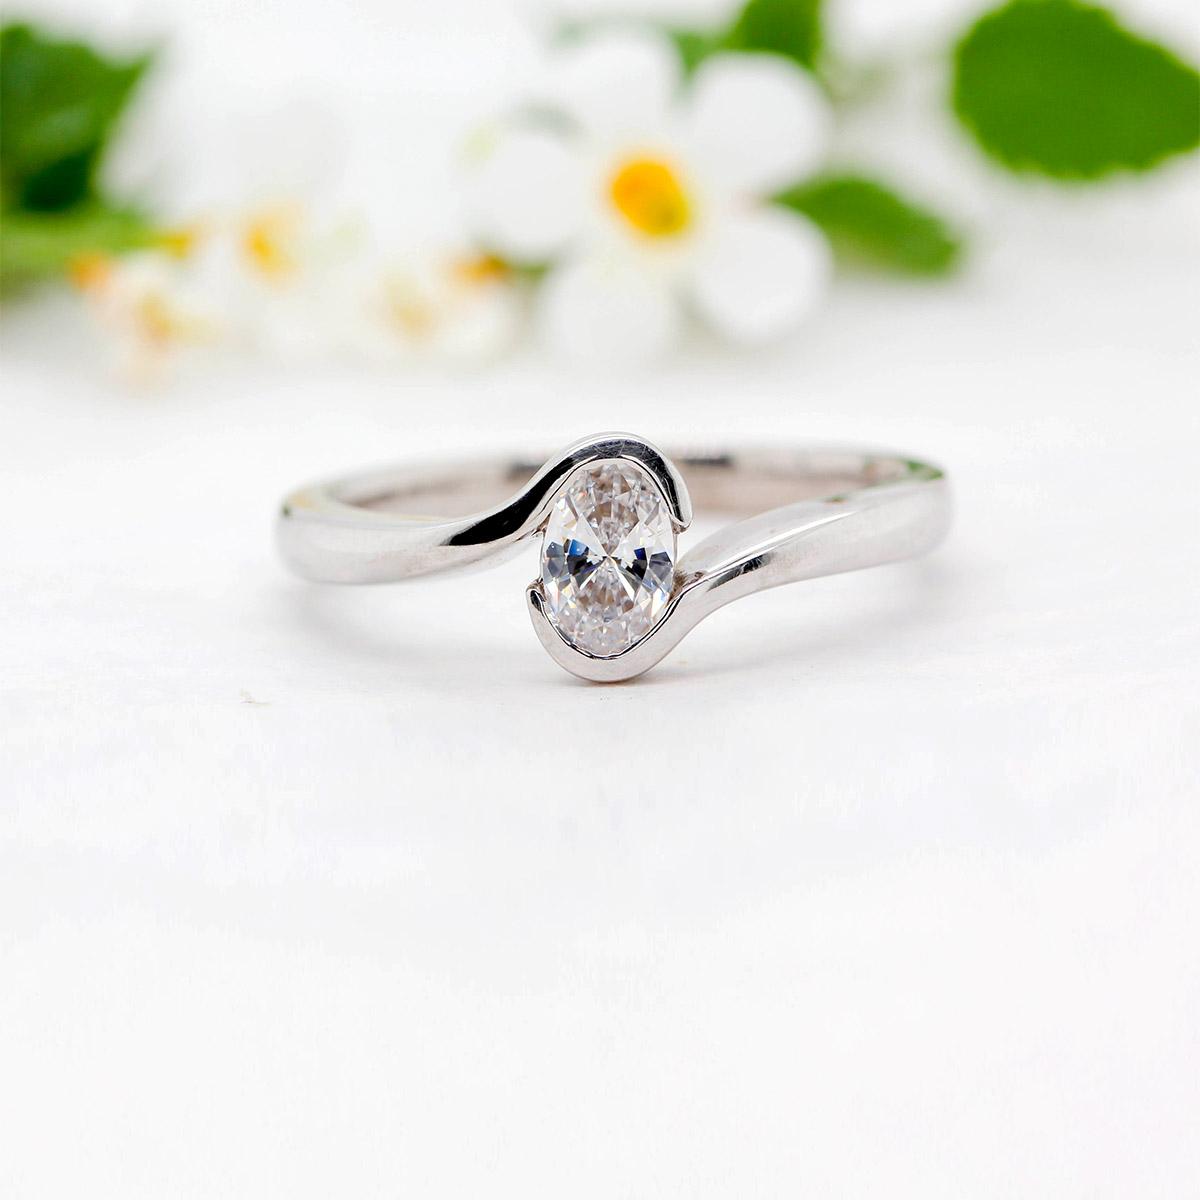 Synthetic Oval Cut Diamond Ring - Coralie - Ethica Diamonds Cornwall UK